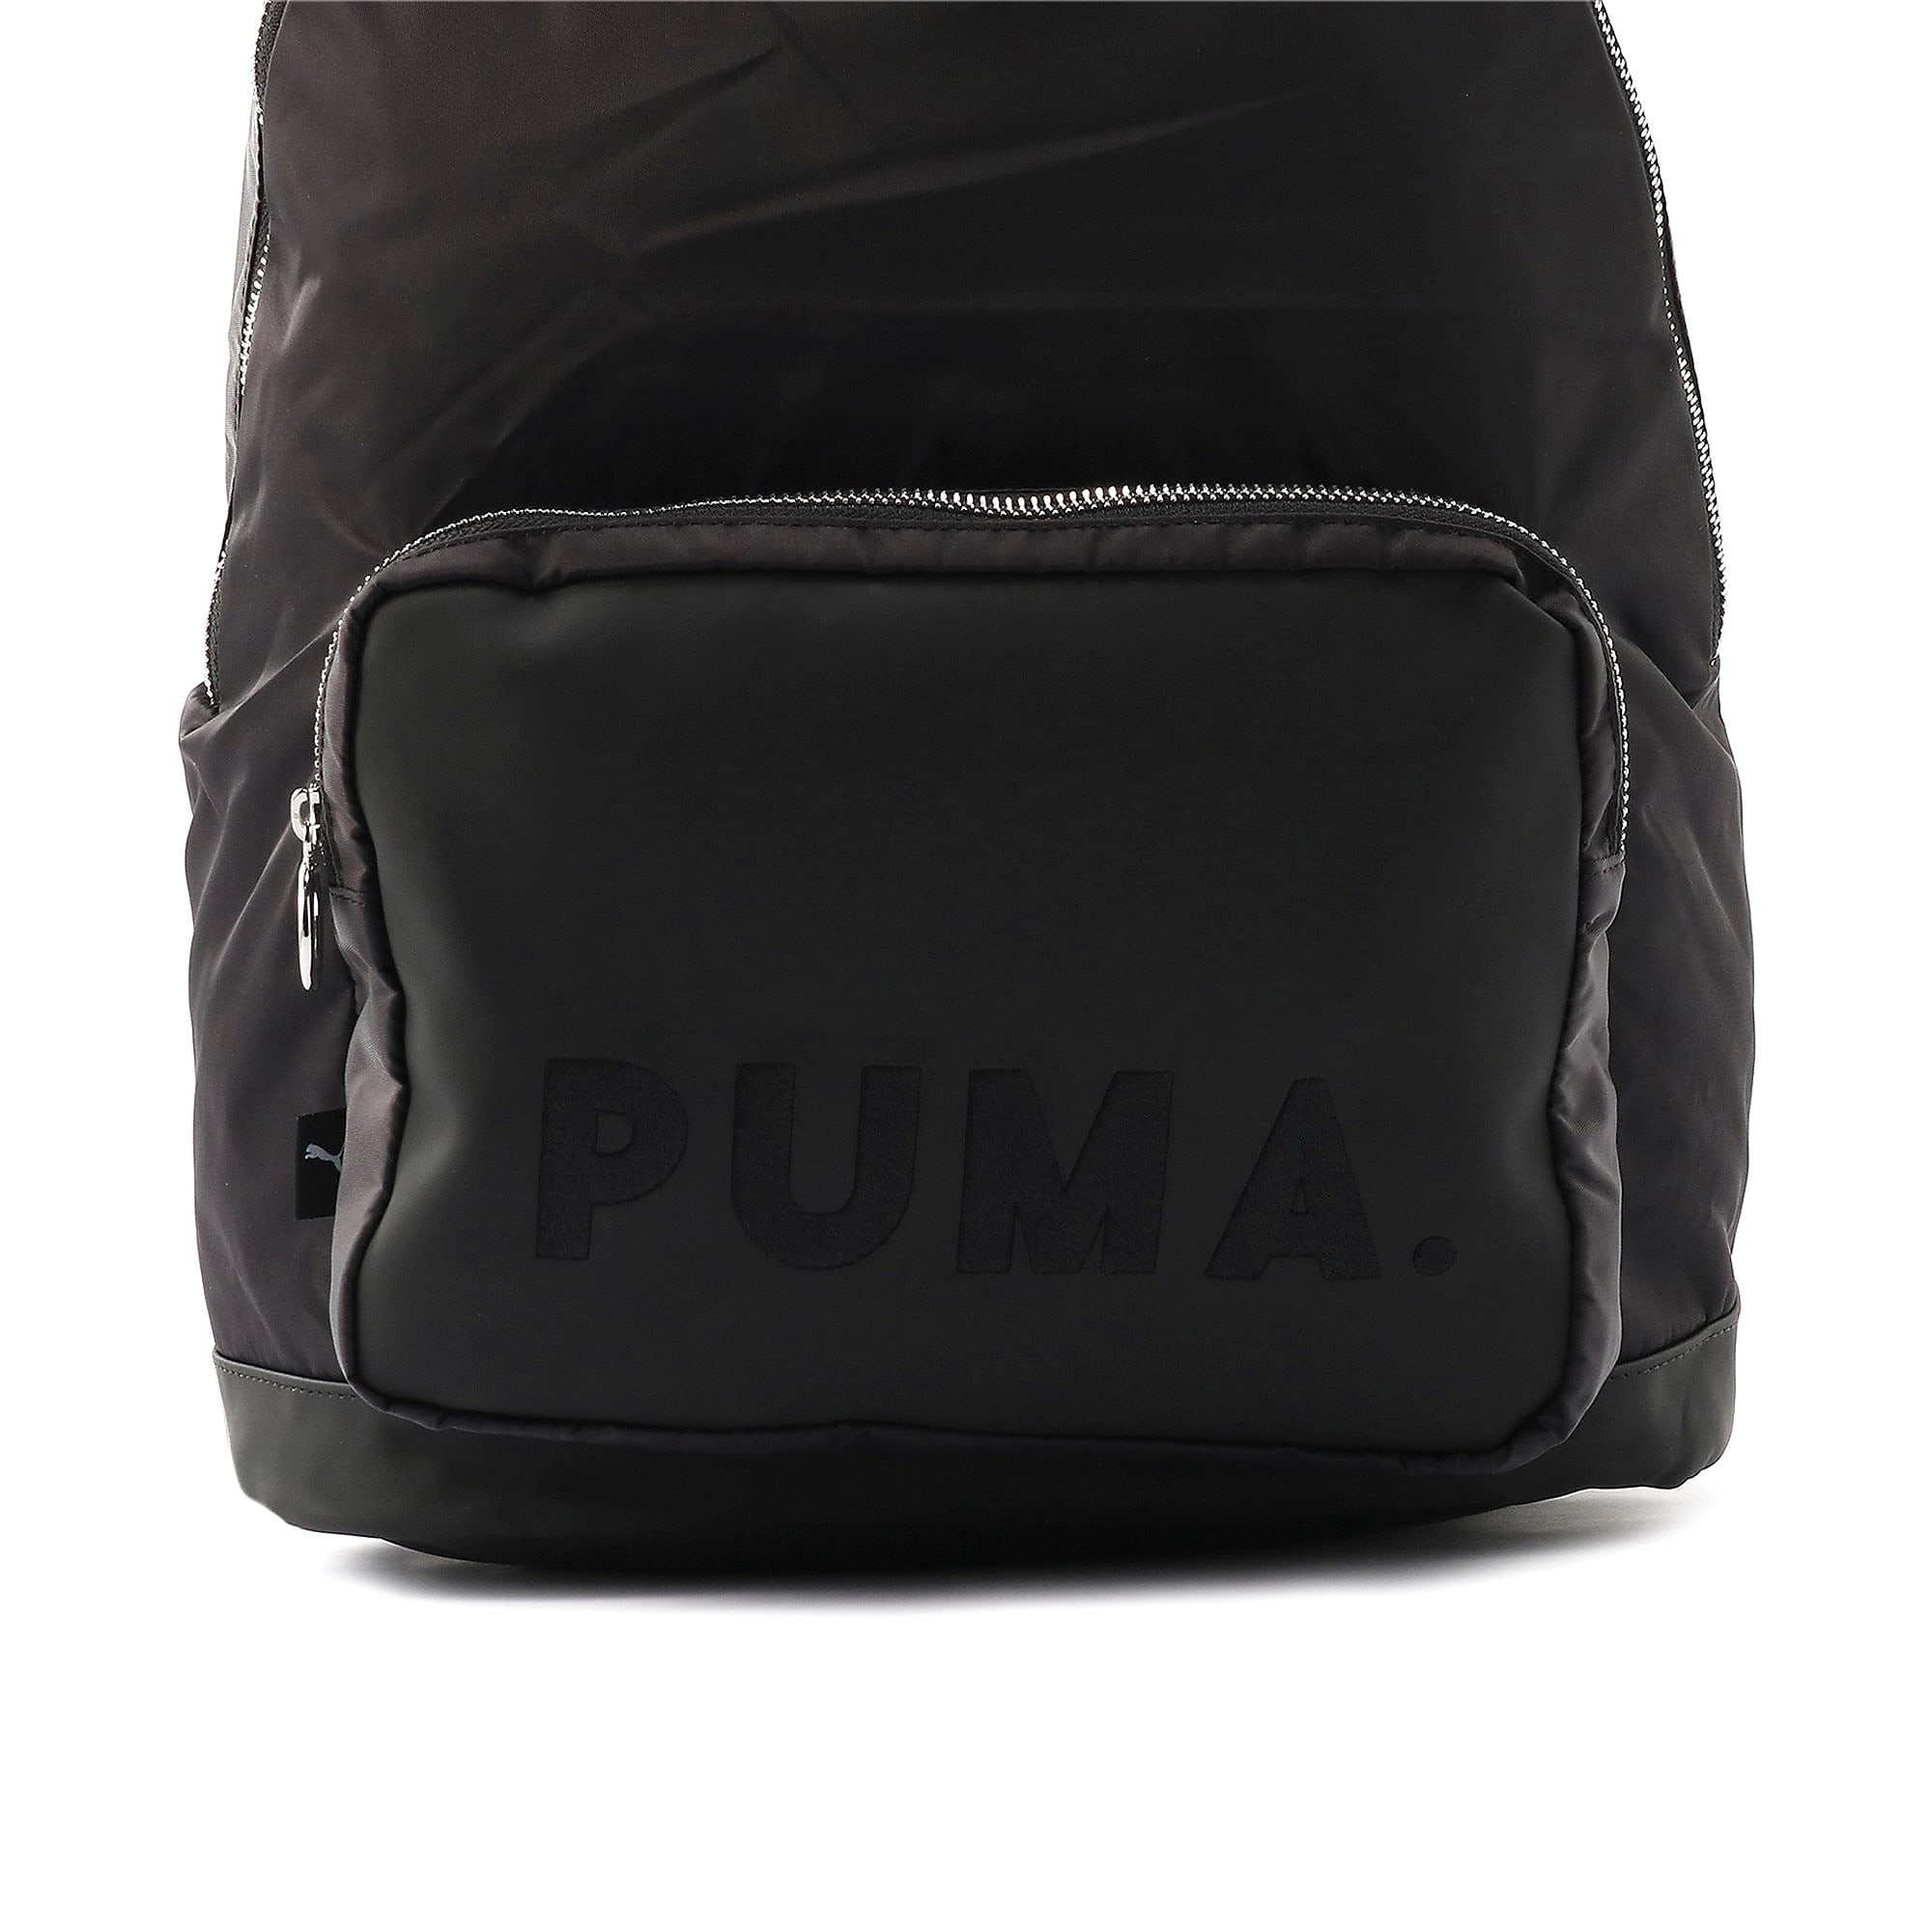 Thumbnail 5 of オリジナルス バックパック トレンド 24L, Puma Black, medium-JPN